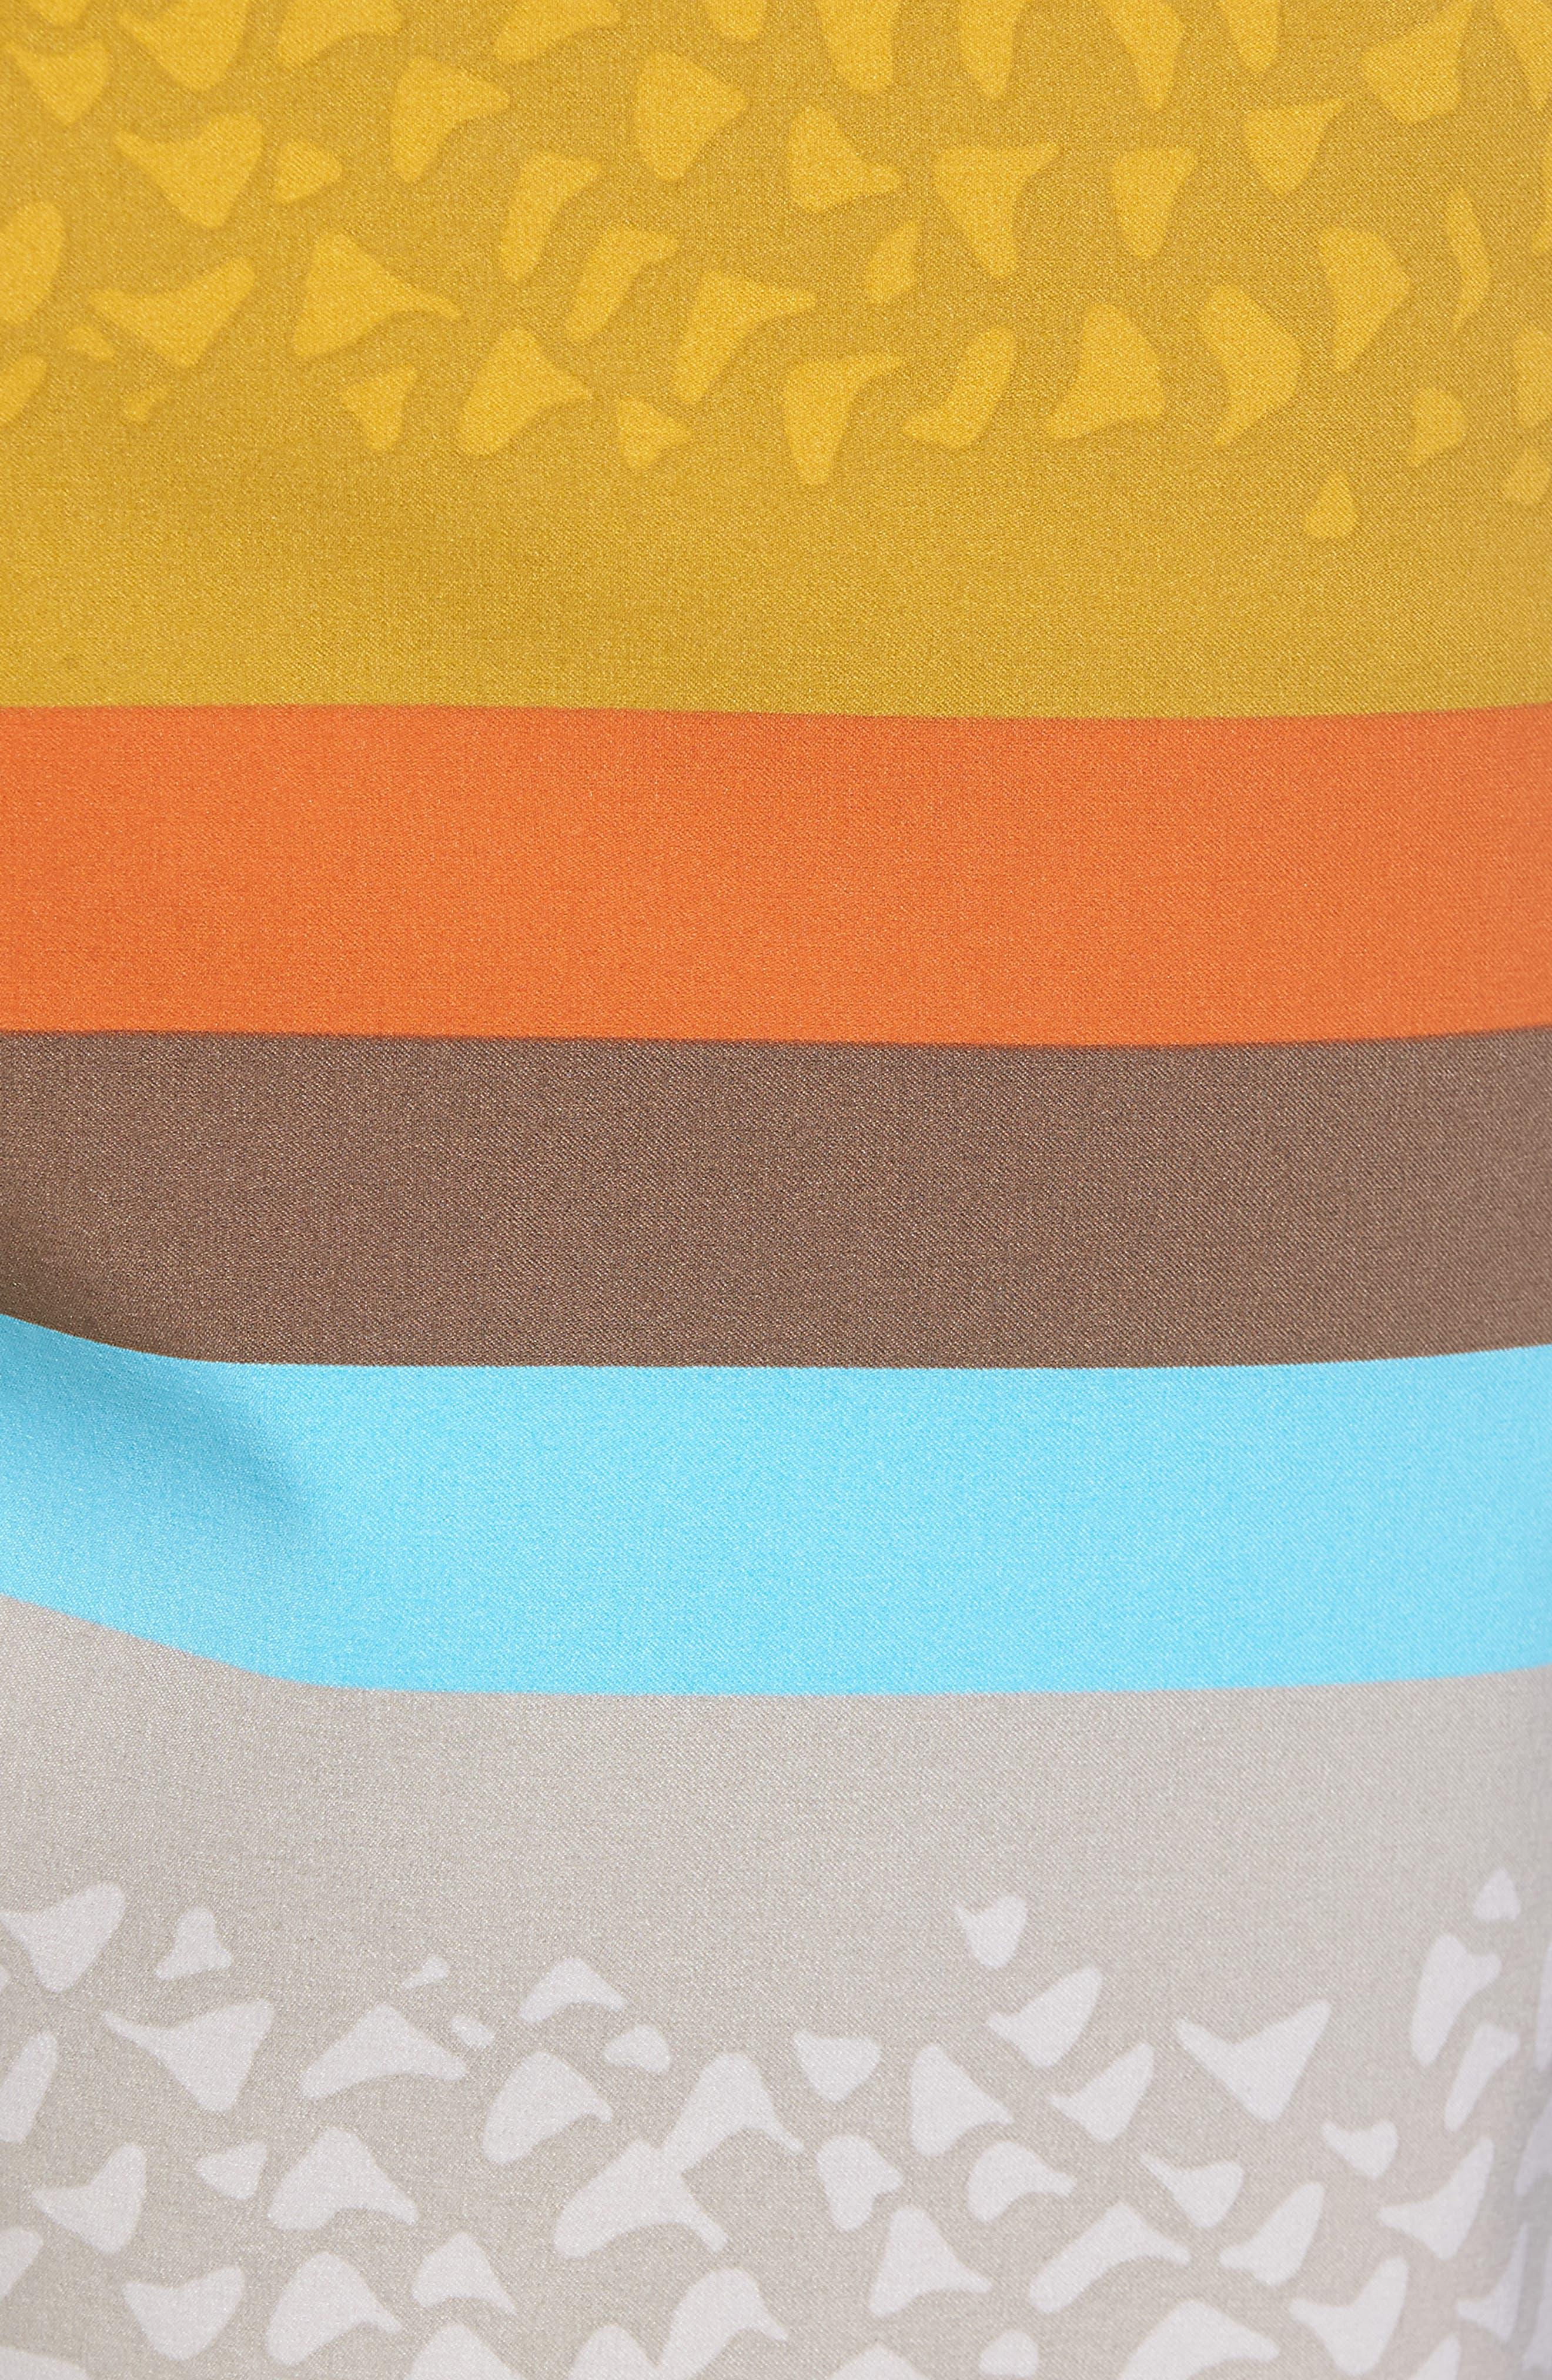 Fifty50 Low Tide Swim Trunks,                             Alternate thumbnail 5, color,                             Stone